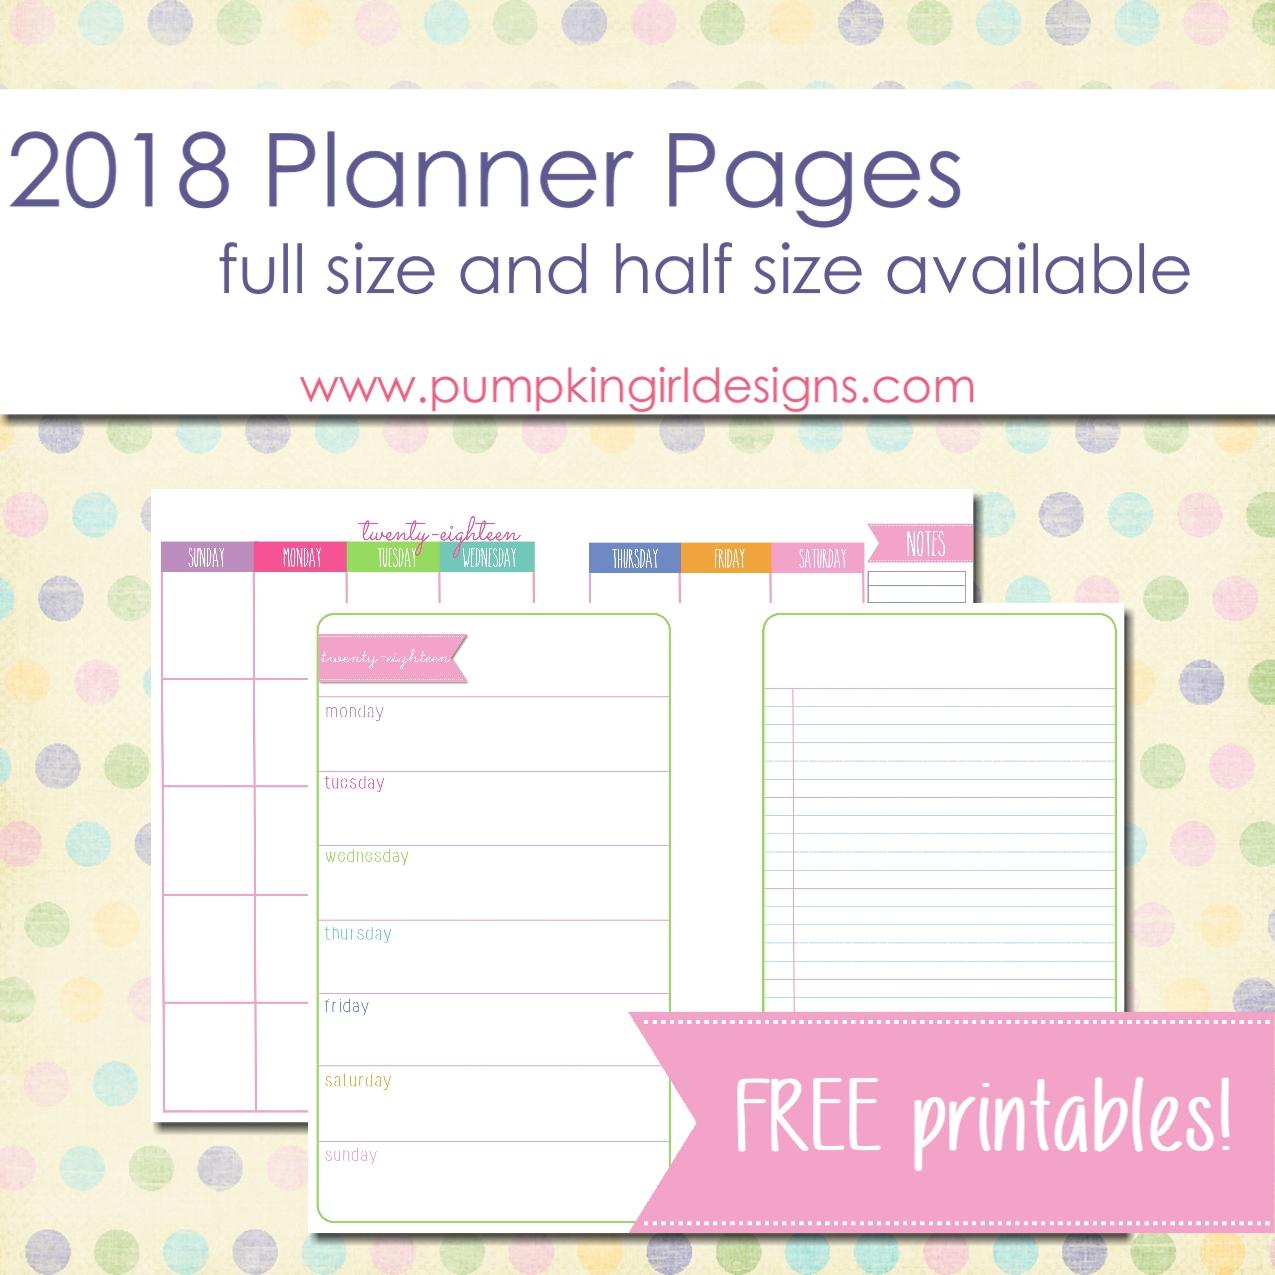 Justlorri@gmail | Pumpkingirl Designs - Free Printable 5.5 X8 5 Planner Pages